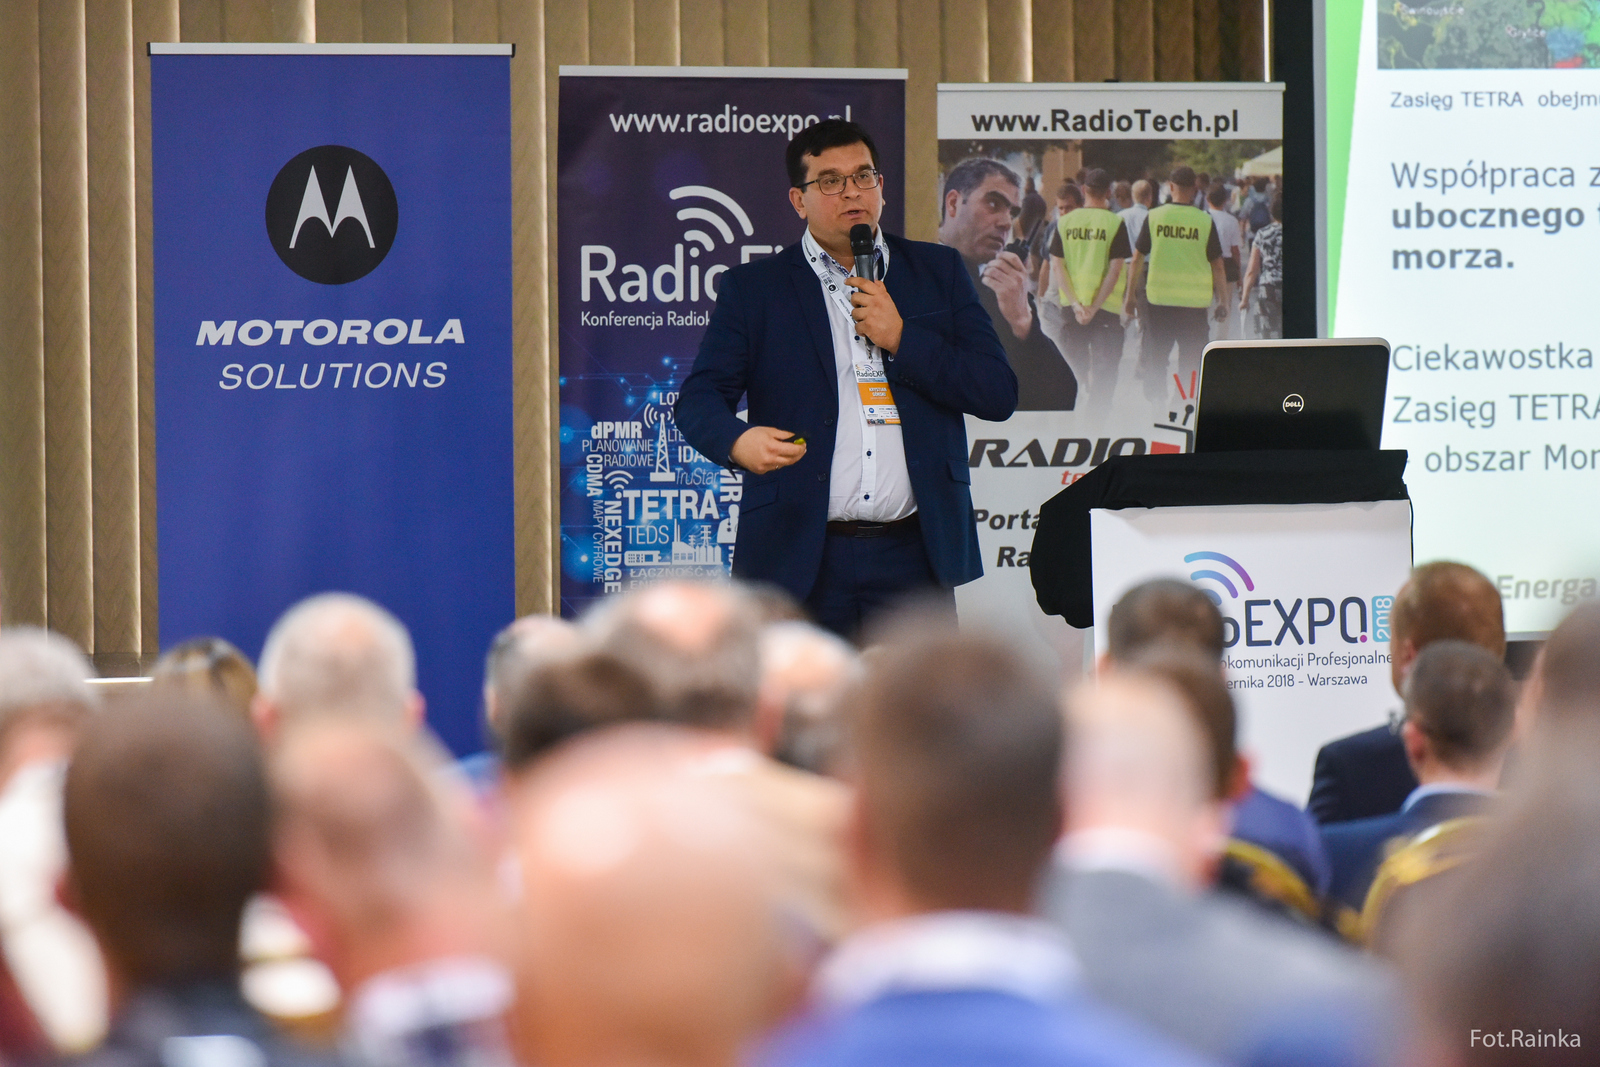 Krystian-Gorski-Energa-Operator-konferencja-RadioEXPO-2018-Warszawa